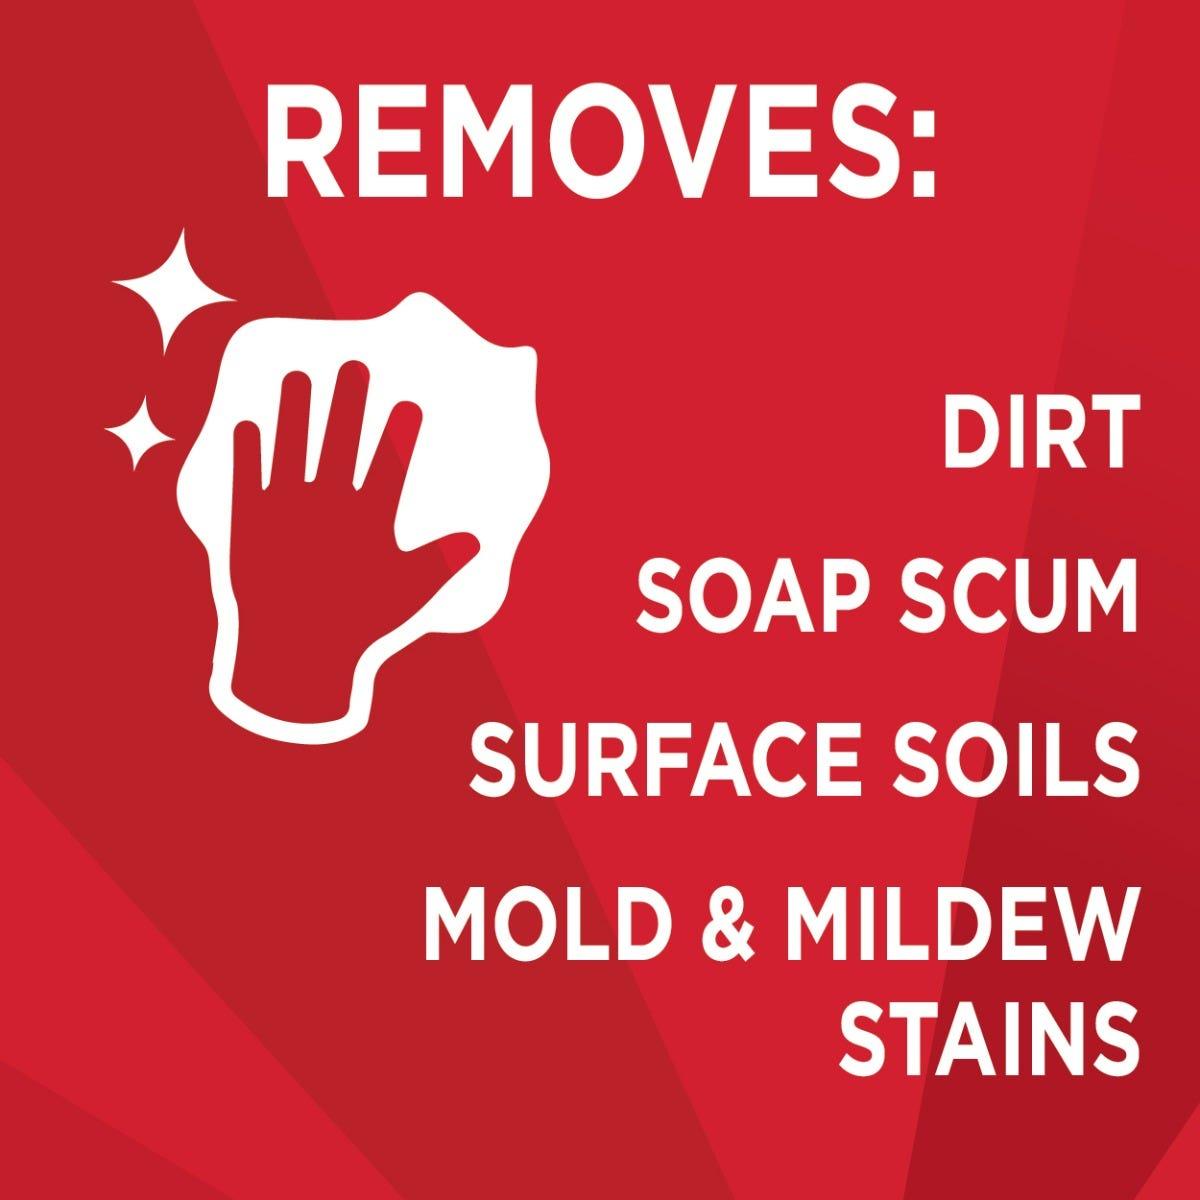 https://googone.com/media/catalog/product/g/r/grout_cleaner_scrubbing_tip_uses.jpg